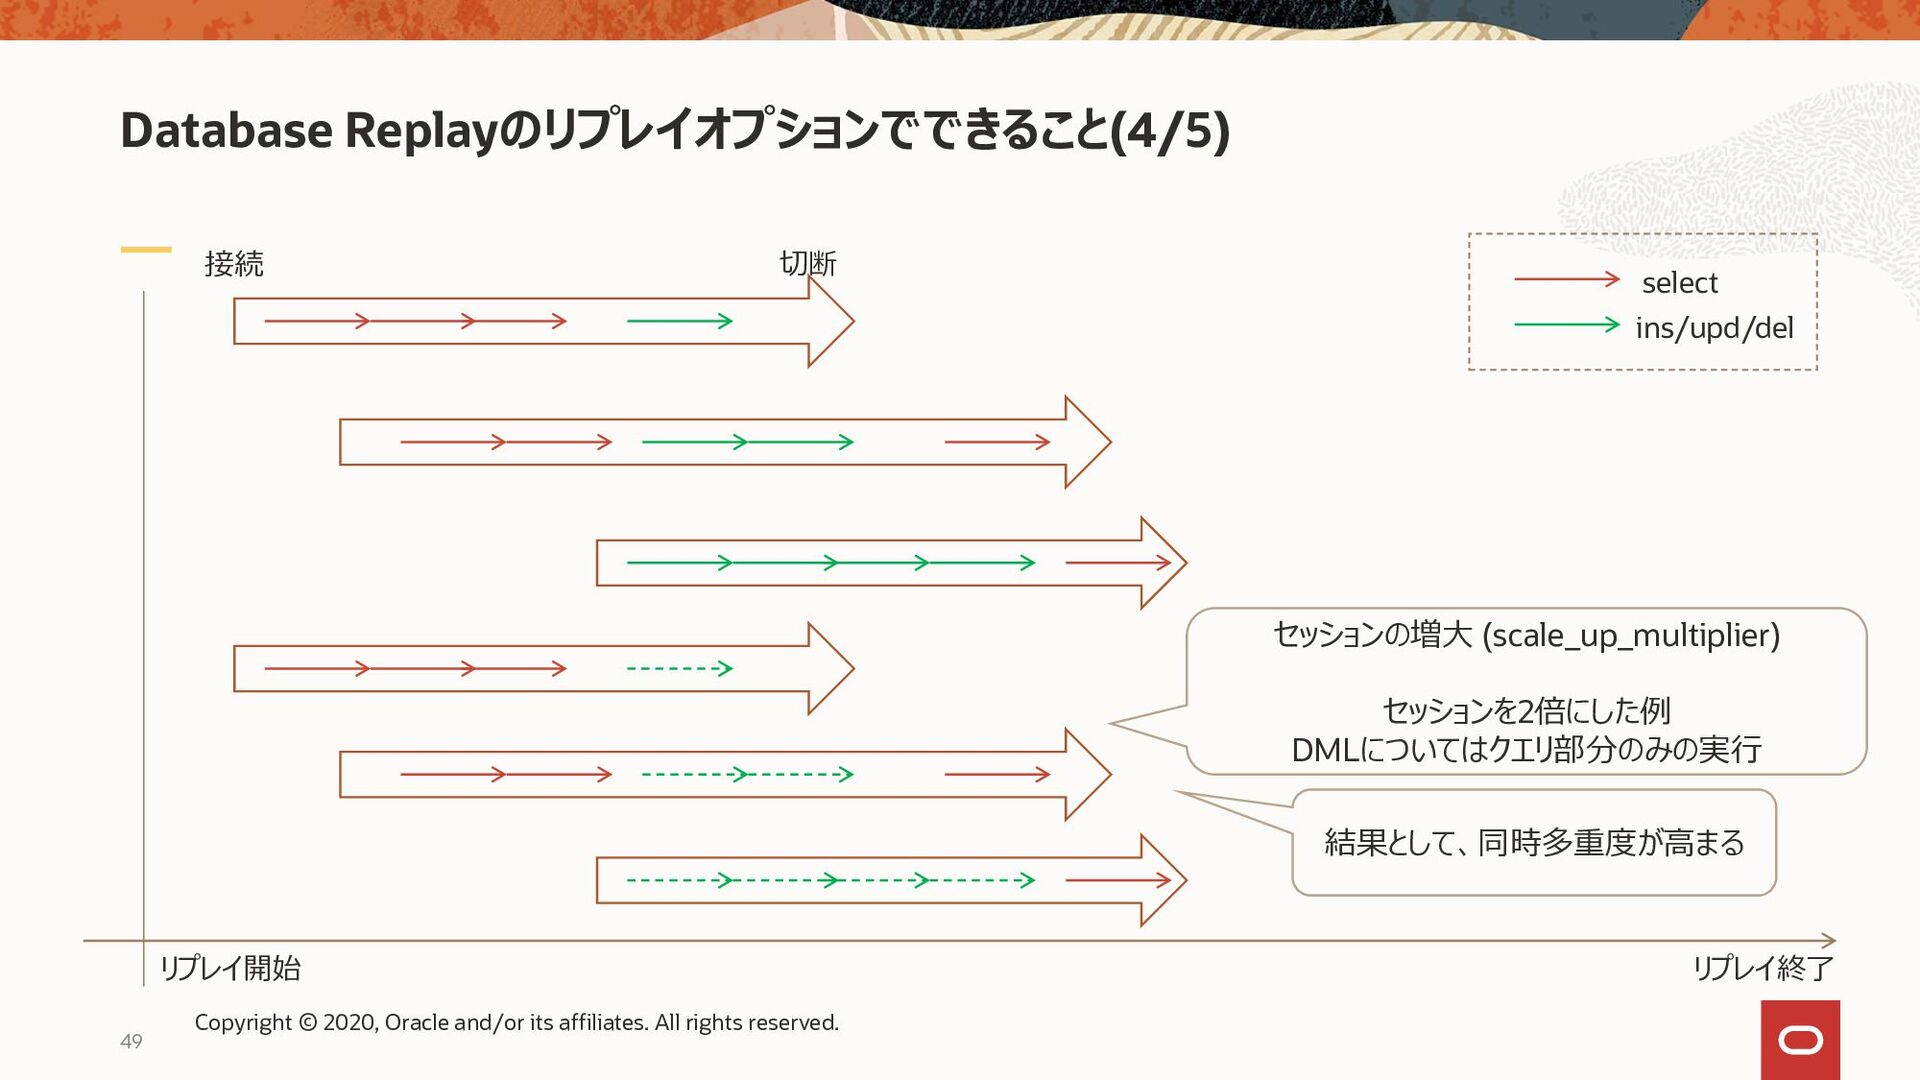 Database Replayのリプレイオプションでできること(5/5) 接続 切断 リプレイ...